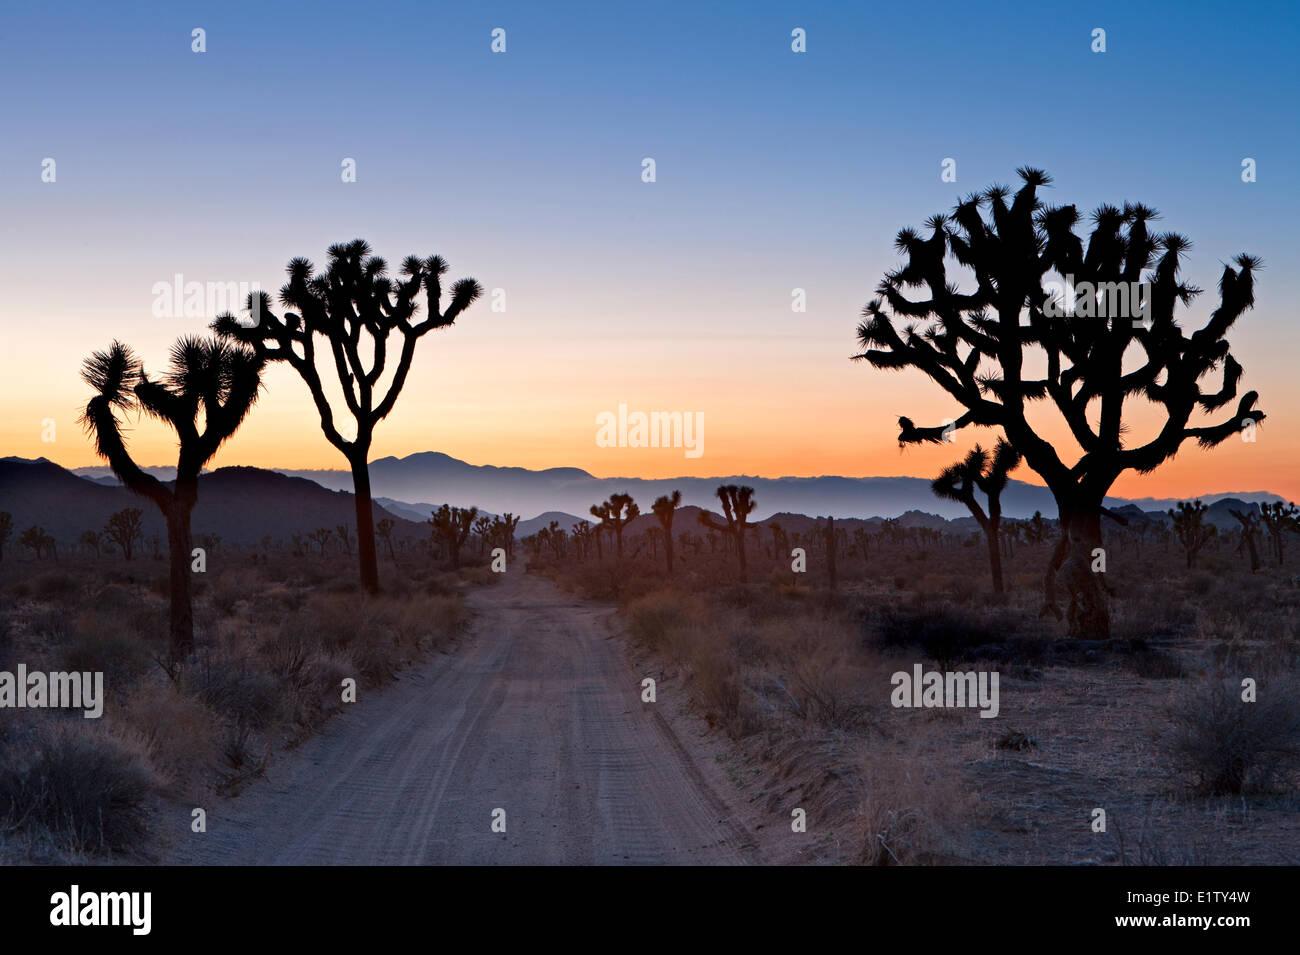 Joshua Tree, Joshua Tree National Park, Mojave desert, California, USA - Stock Image